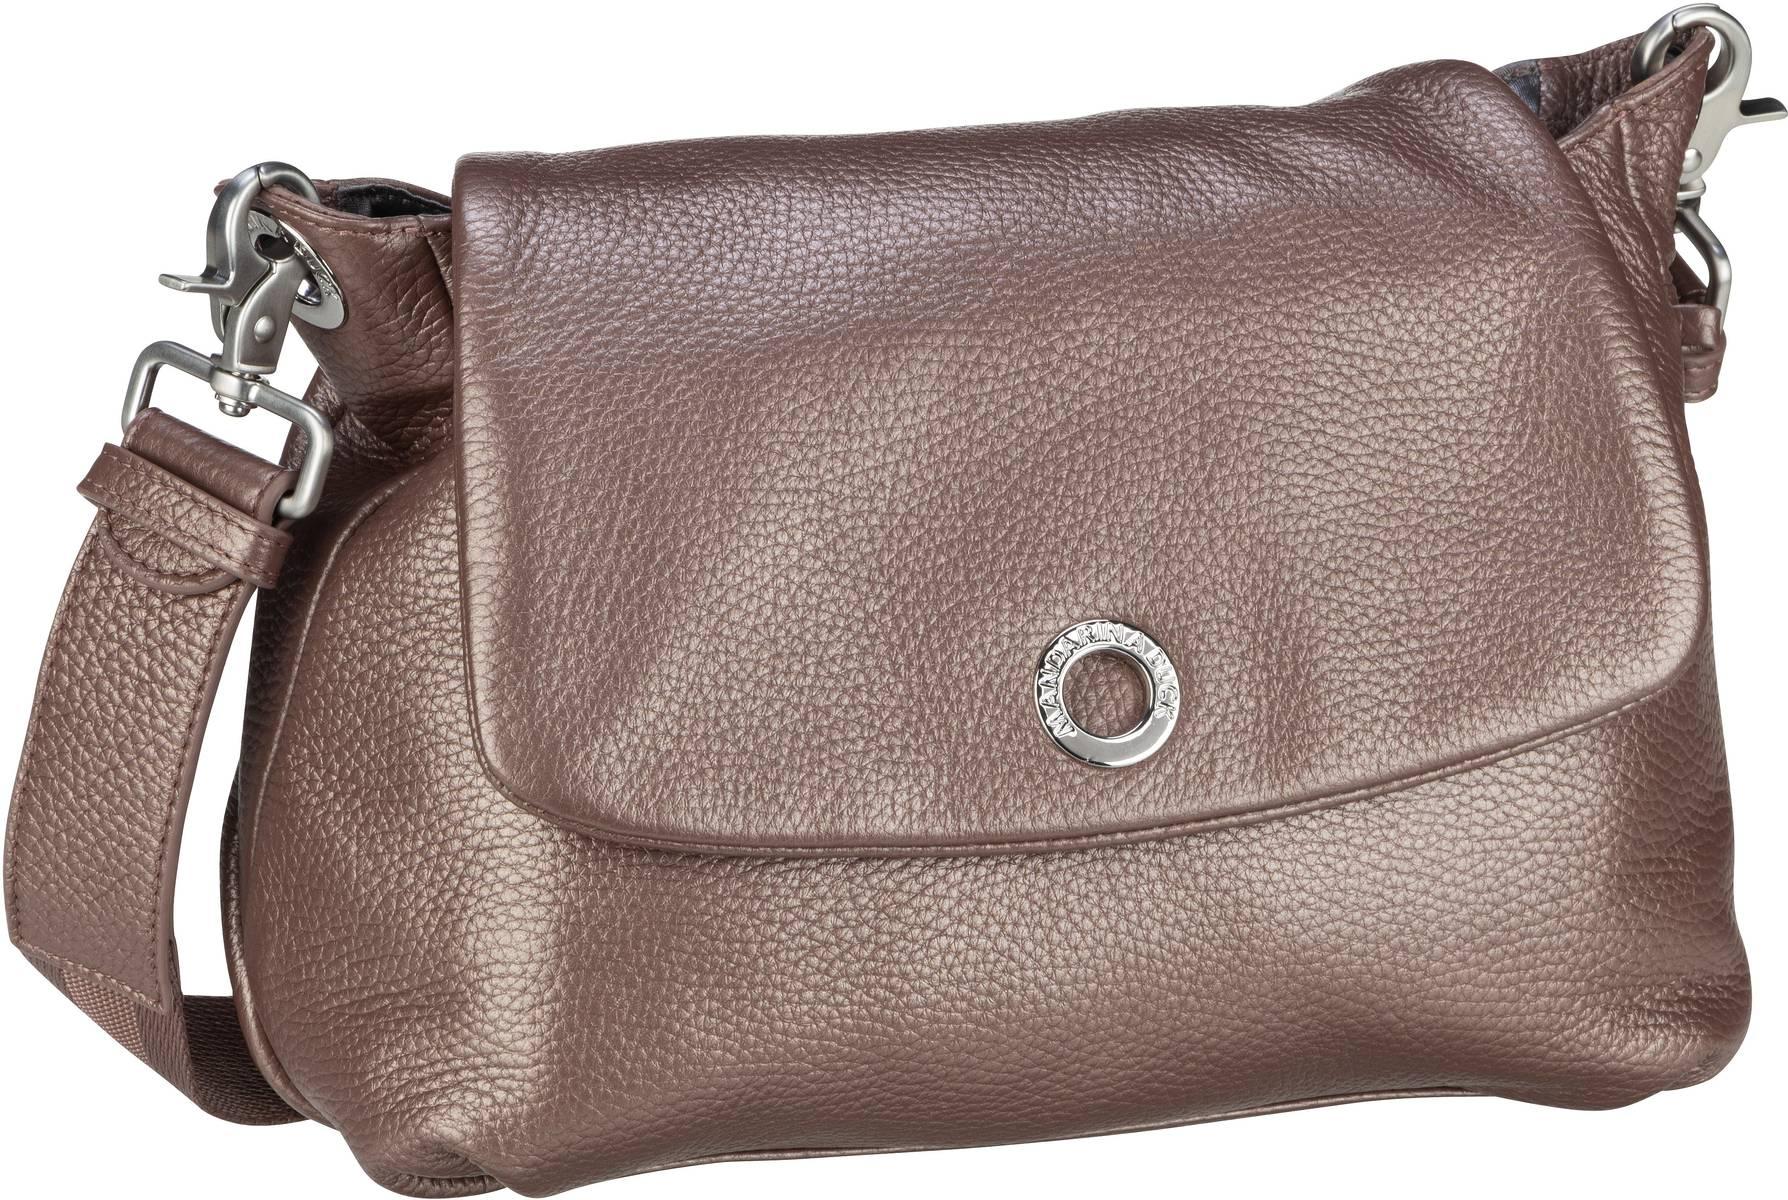 Umhängetasche Mellow Leather Lux Small Shoulder Bag ZLT31 Smog